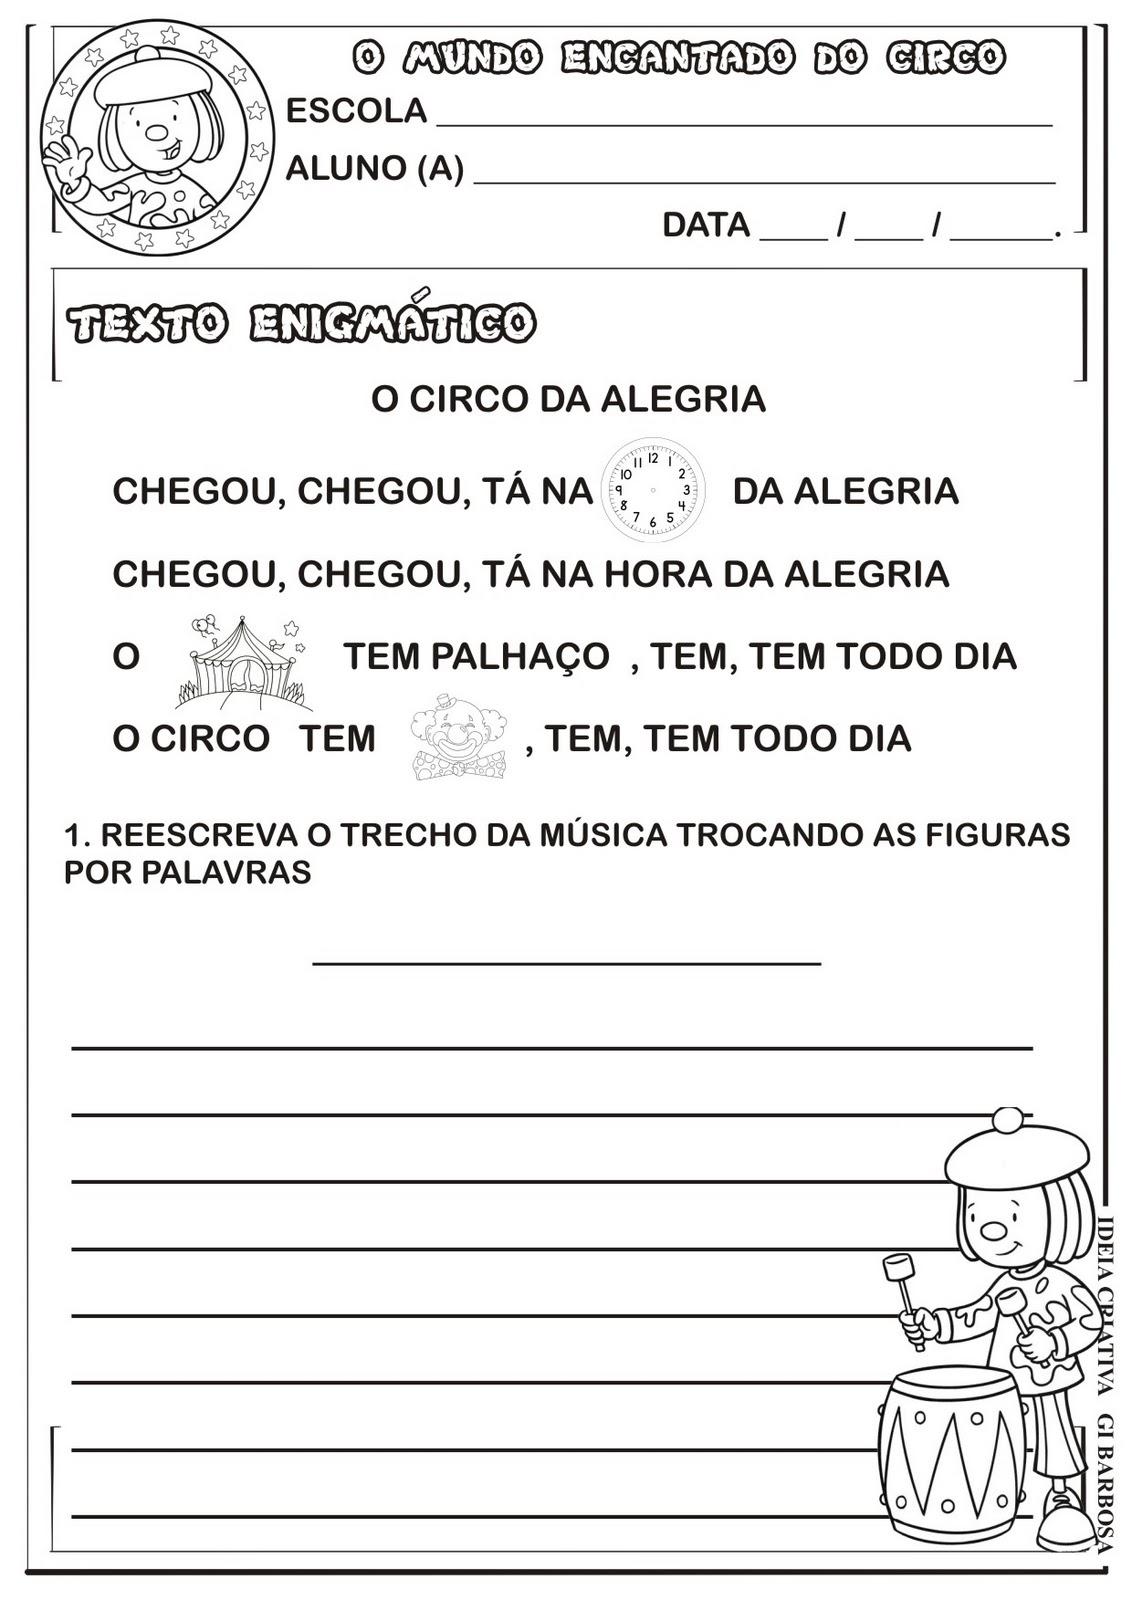 Texto Enigmático Projeto Circo 2012